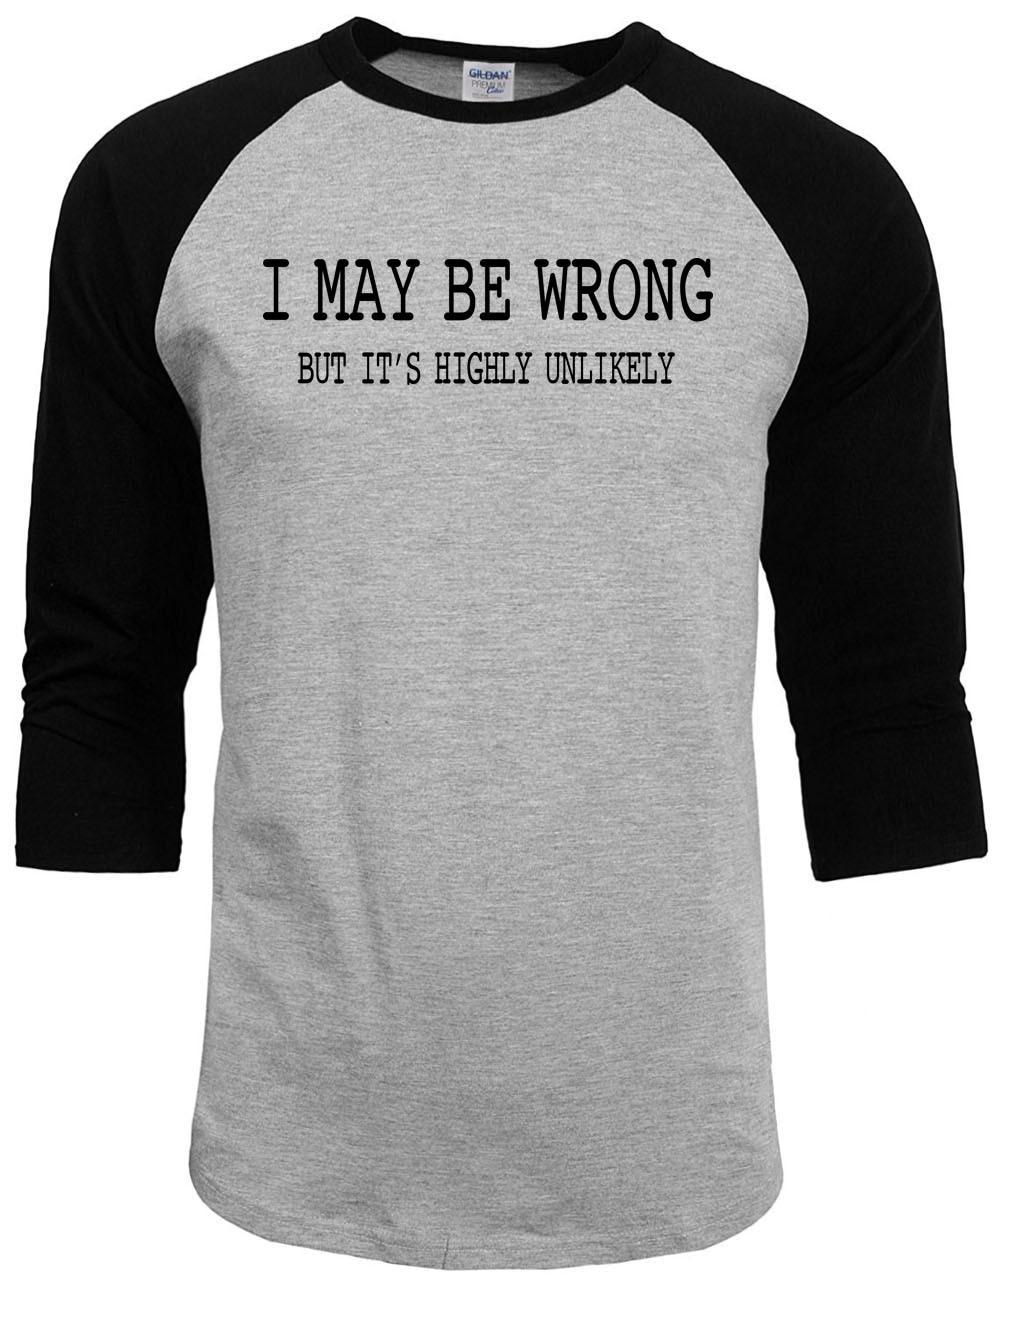 Popular T Shirts Funny Sayings-Buy Cheap T Shirts Funny Sayings ...